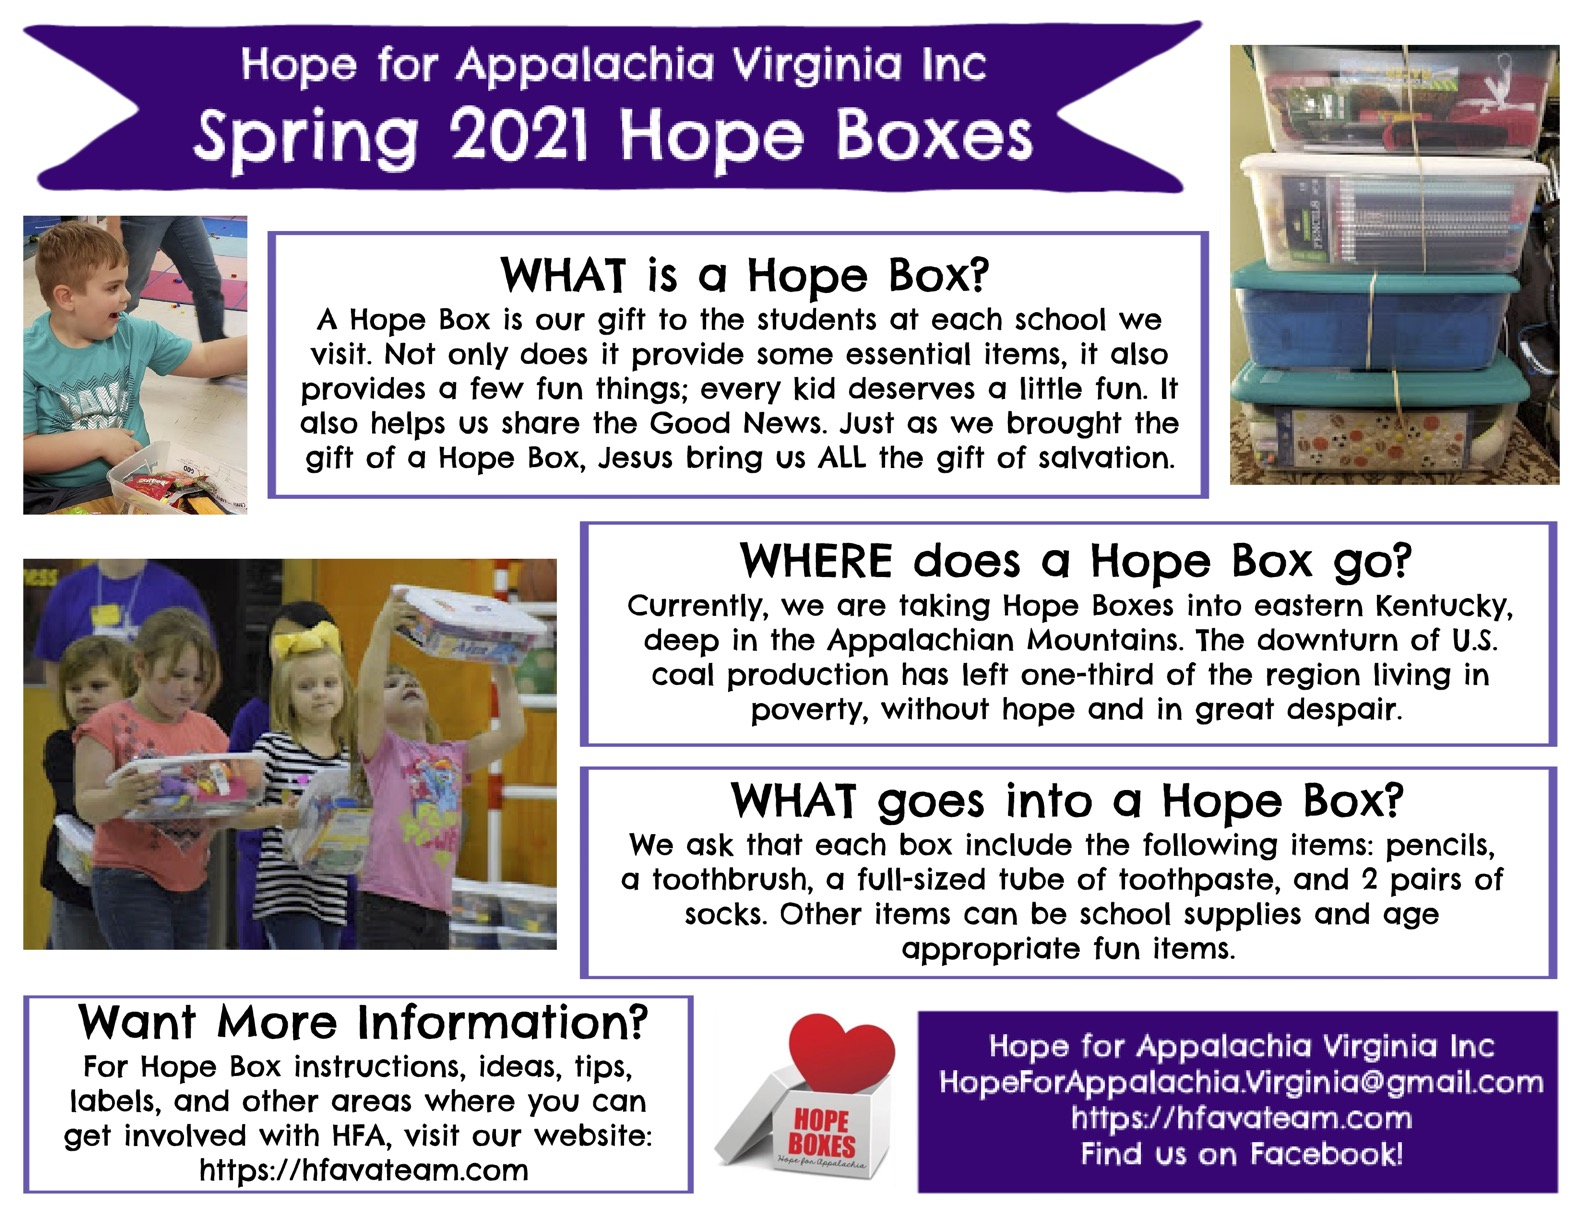 Spring 2021 Hope Box General.jpg